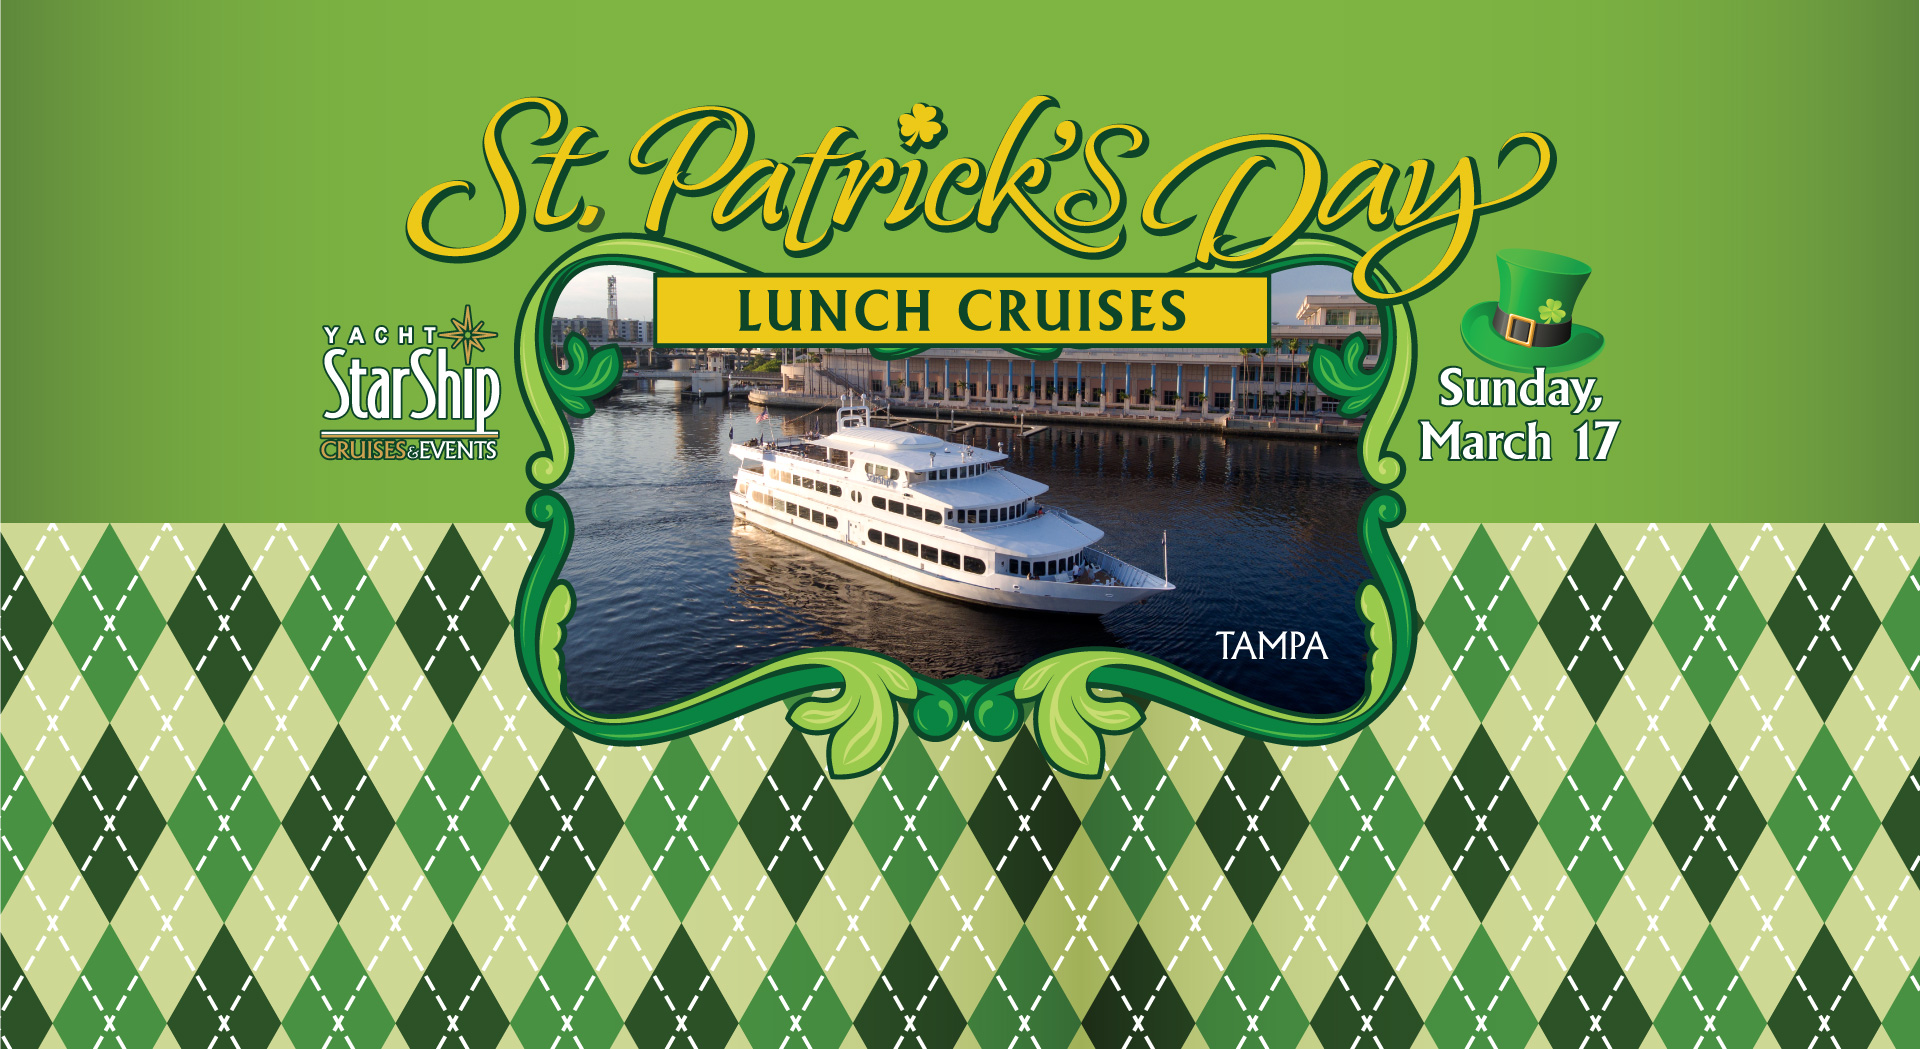 St Patricks Day Cruise Yacht StarShip